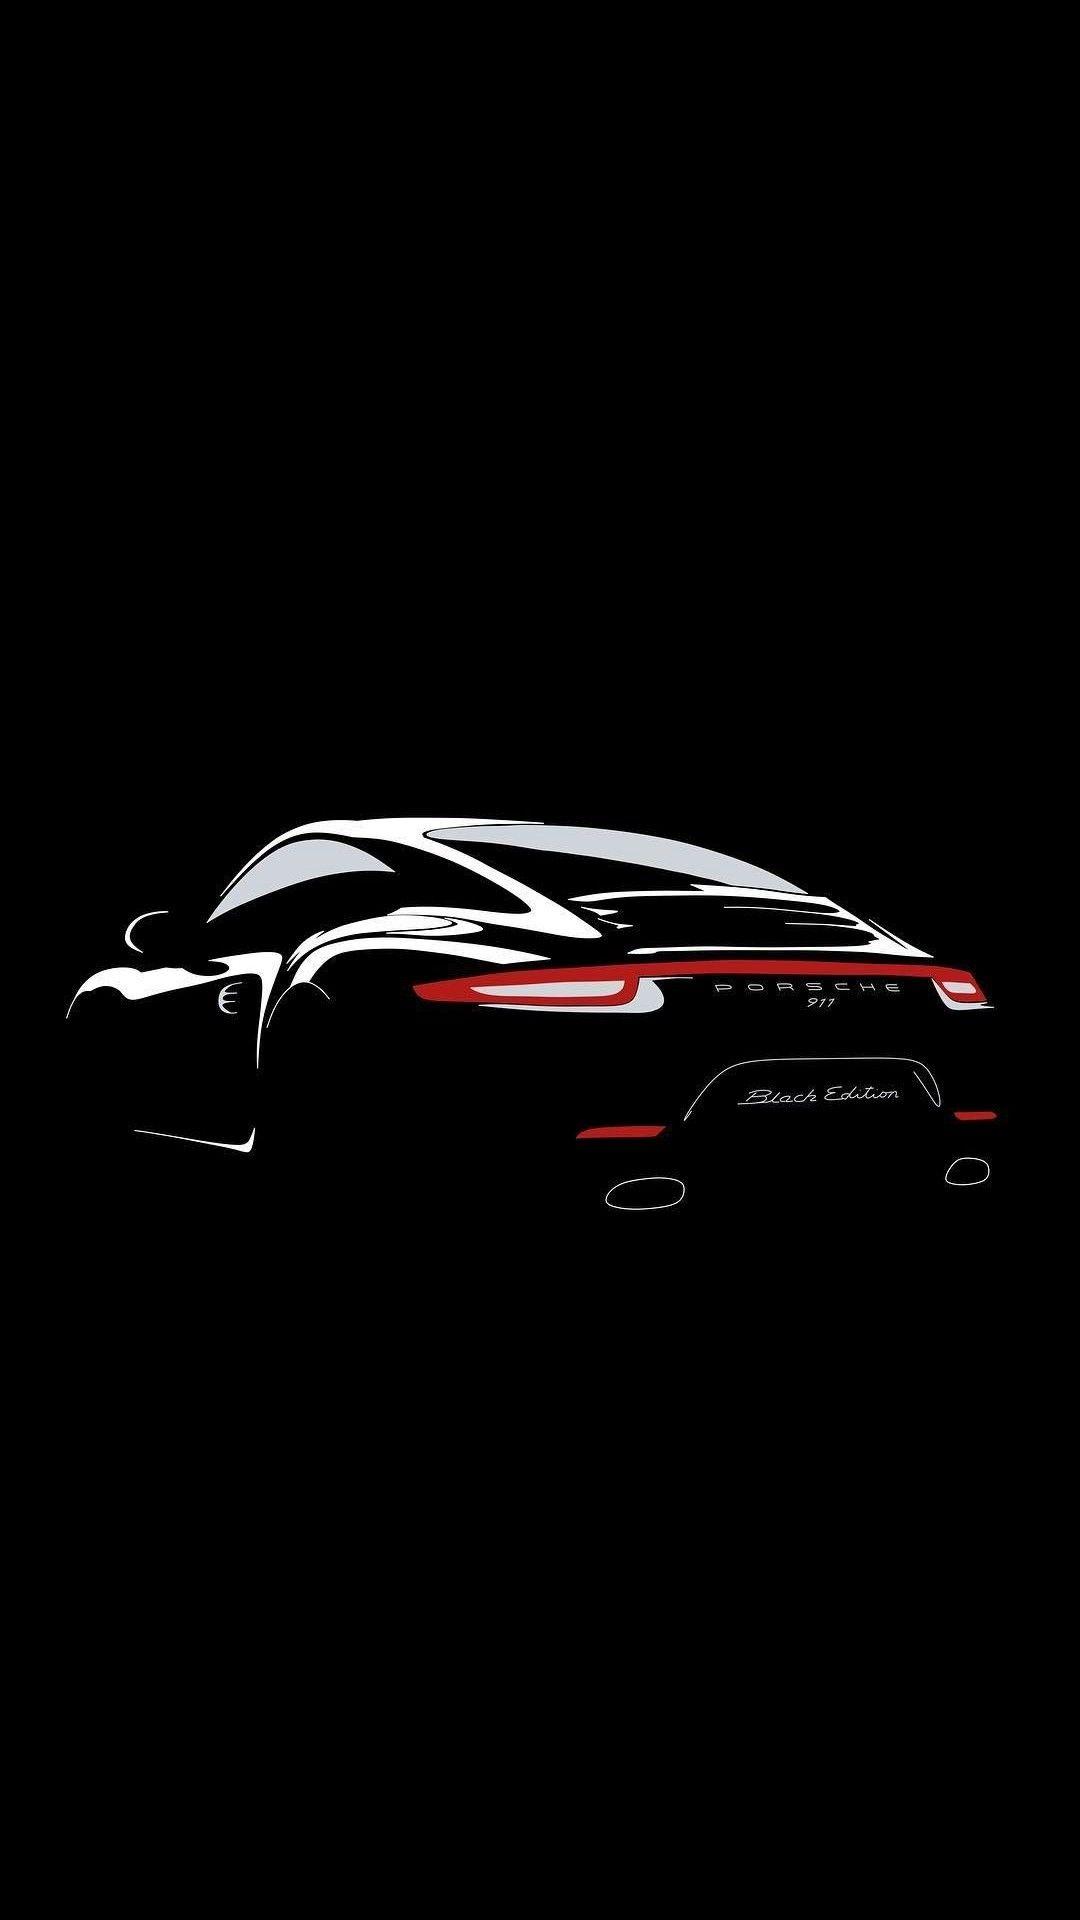 Pin By Yunus X Tremer On Jdm Car Porsche Cars Car Wallpapers Cars